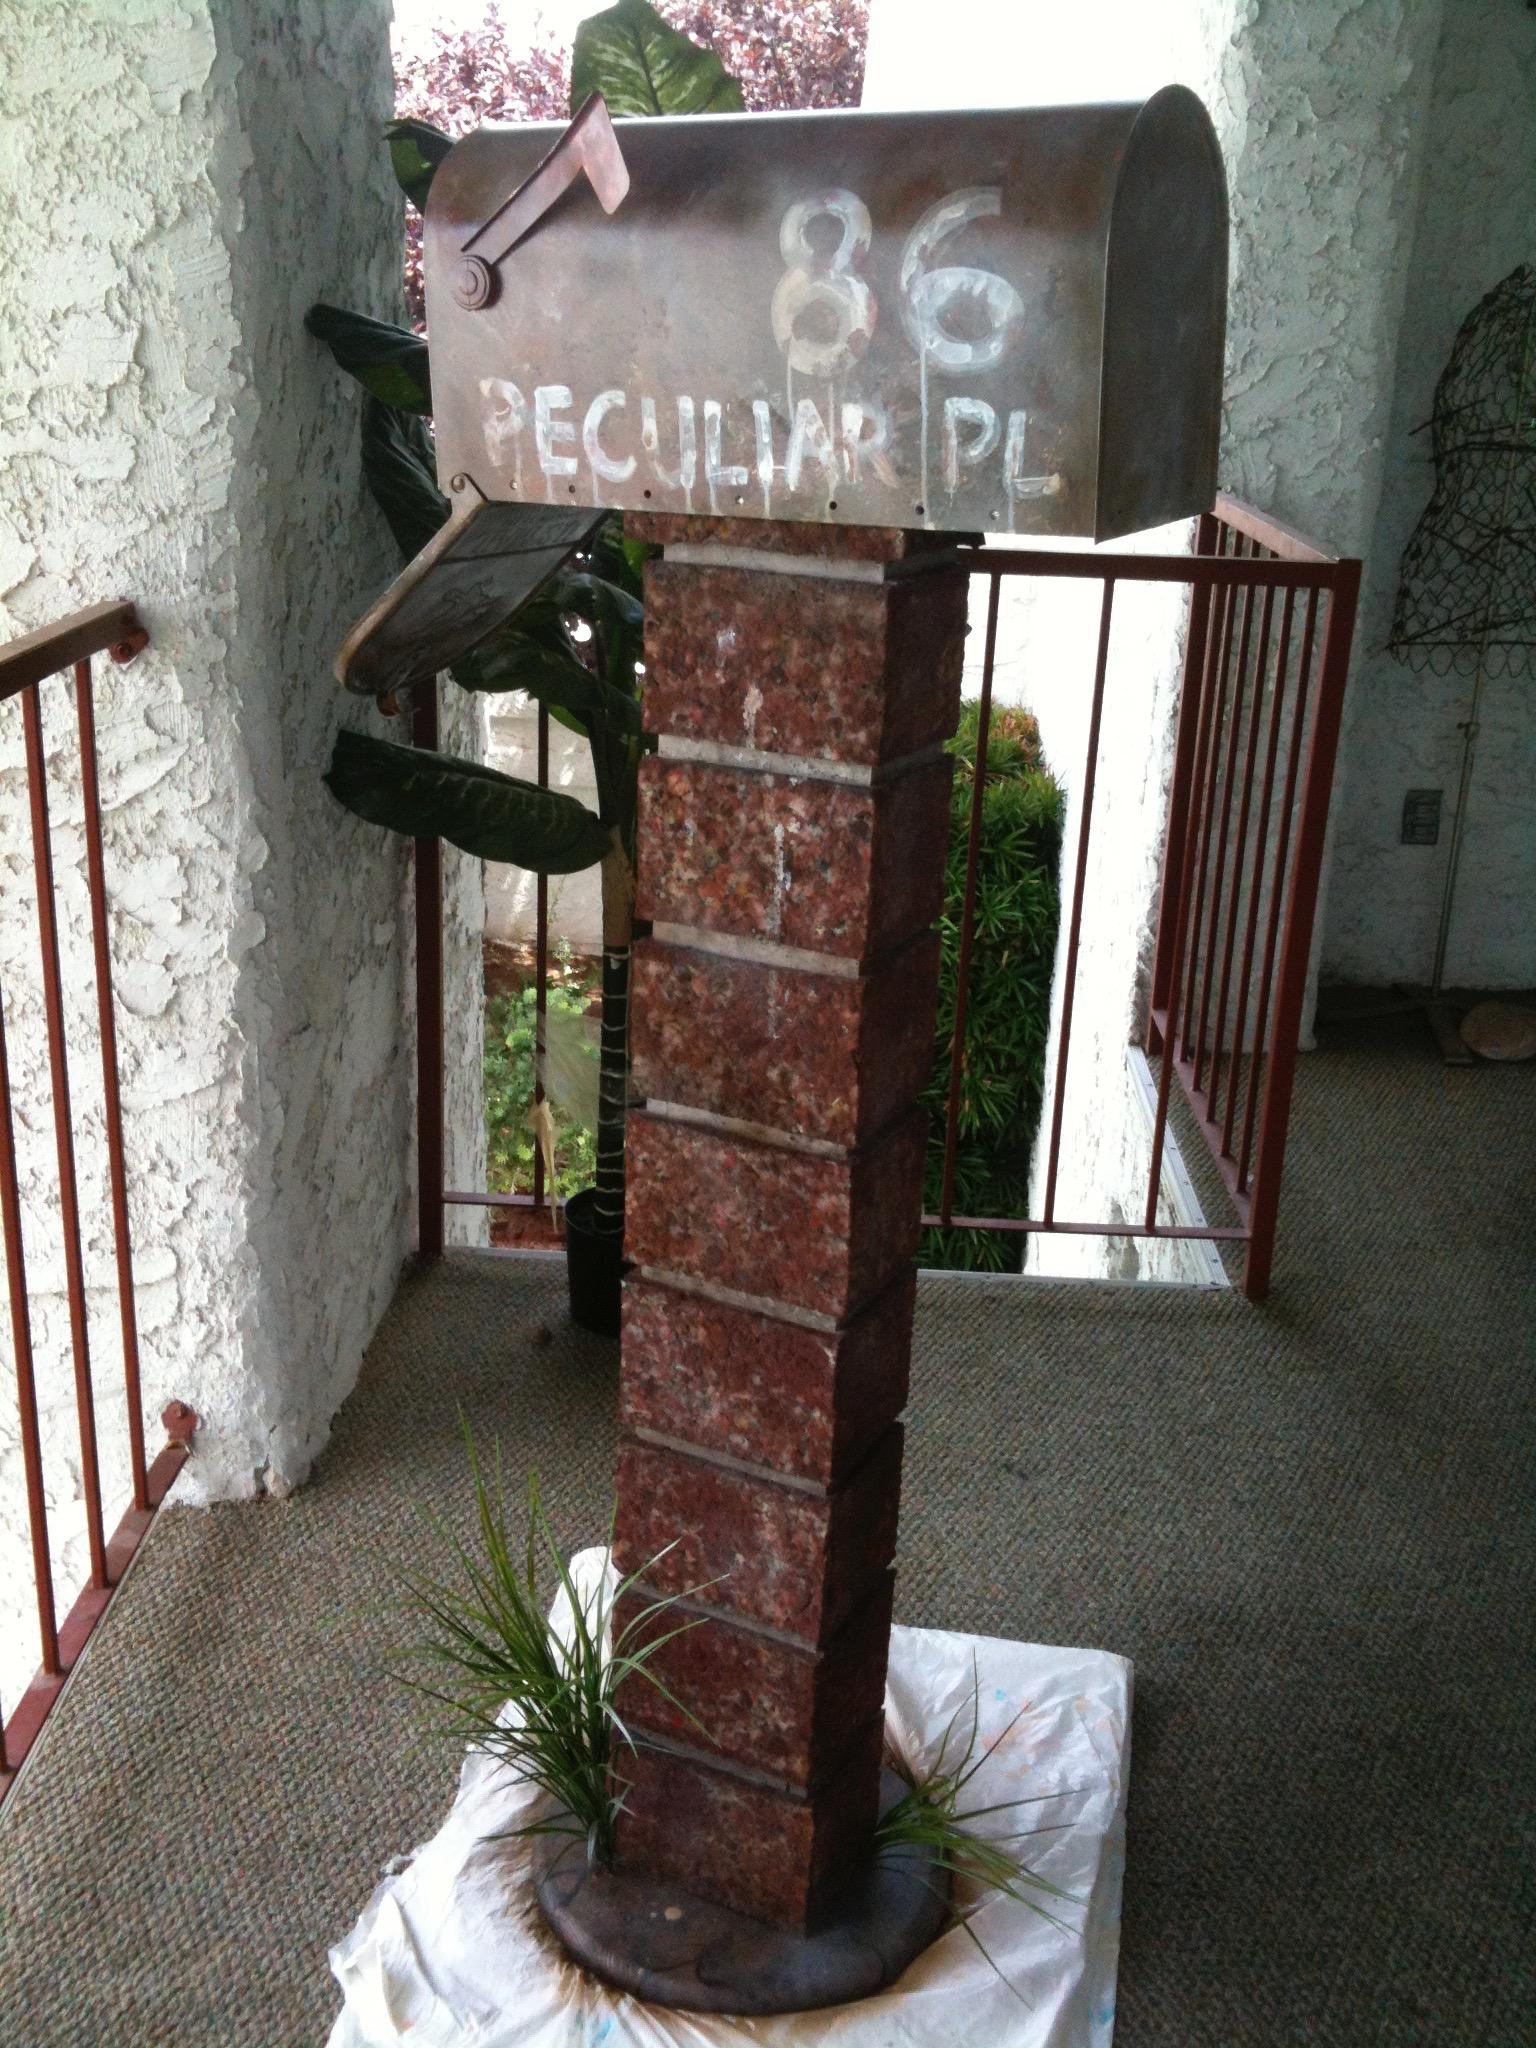 86 Peculiar Place Mailbox